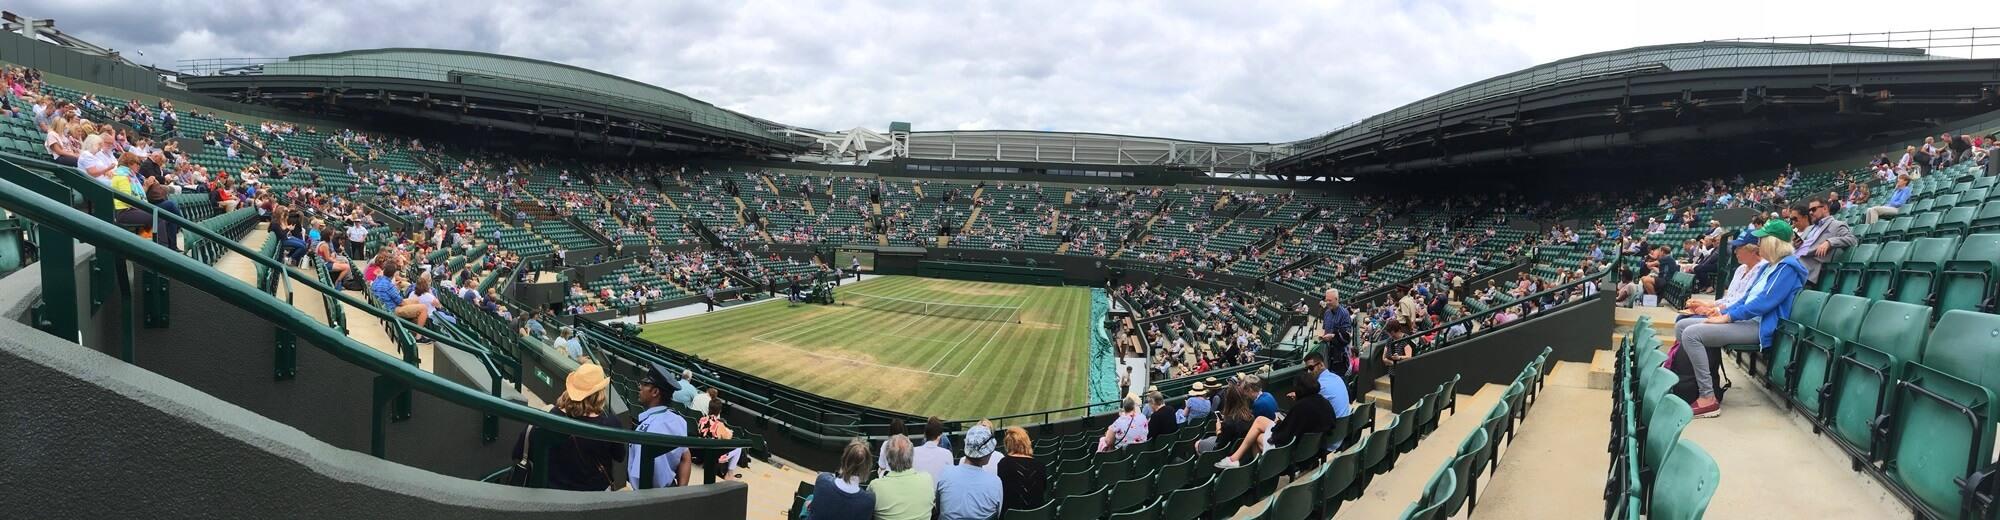 court 1 at Wimbledon day